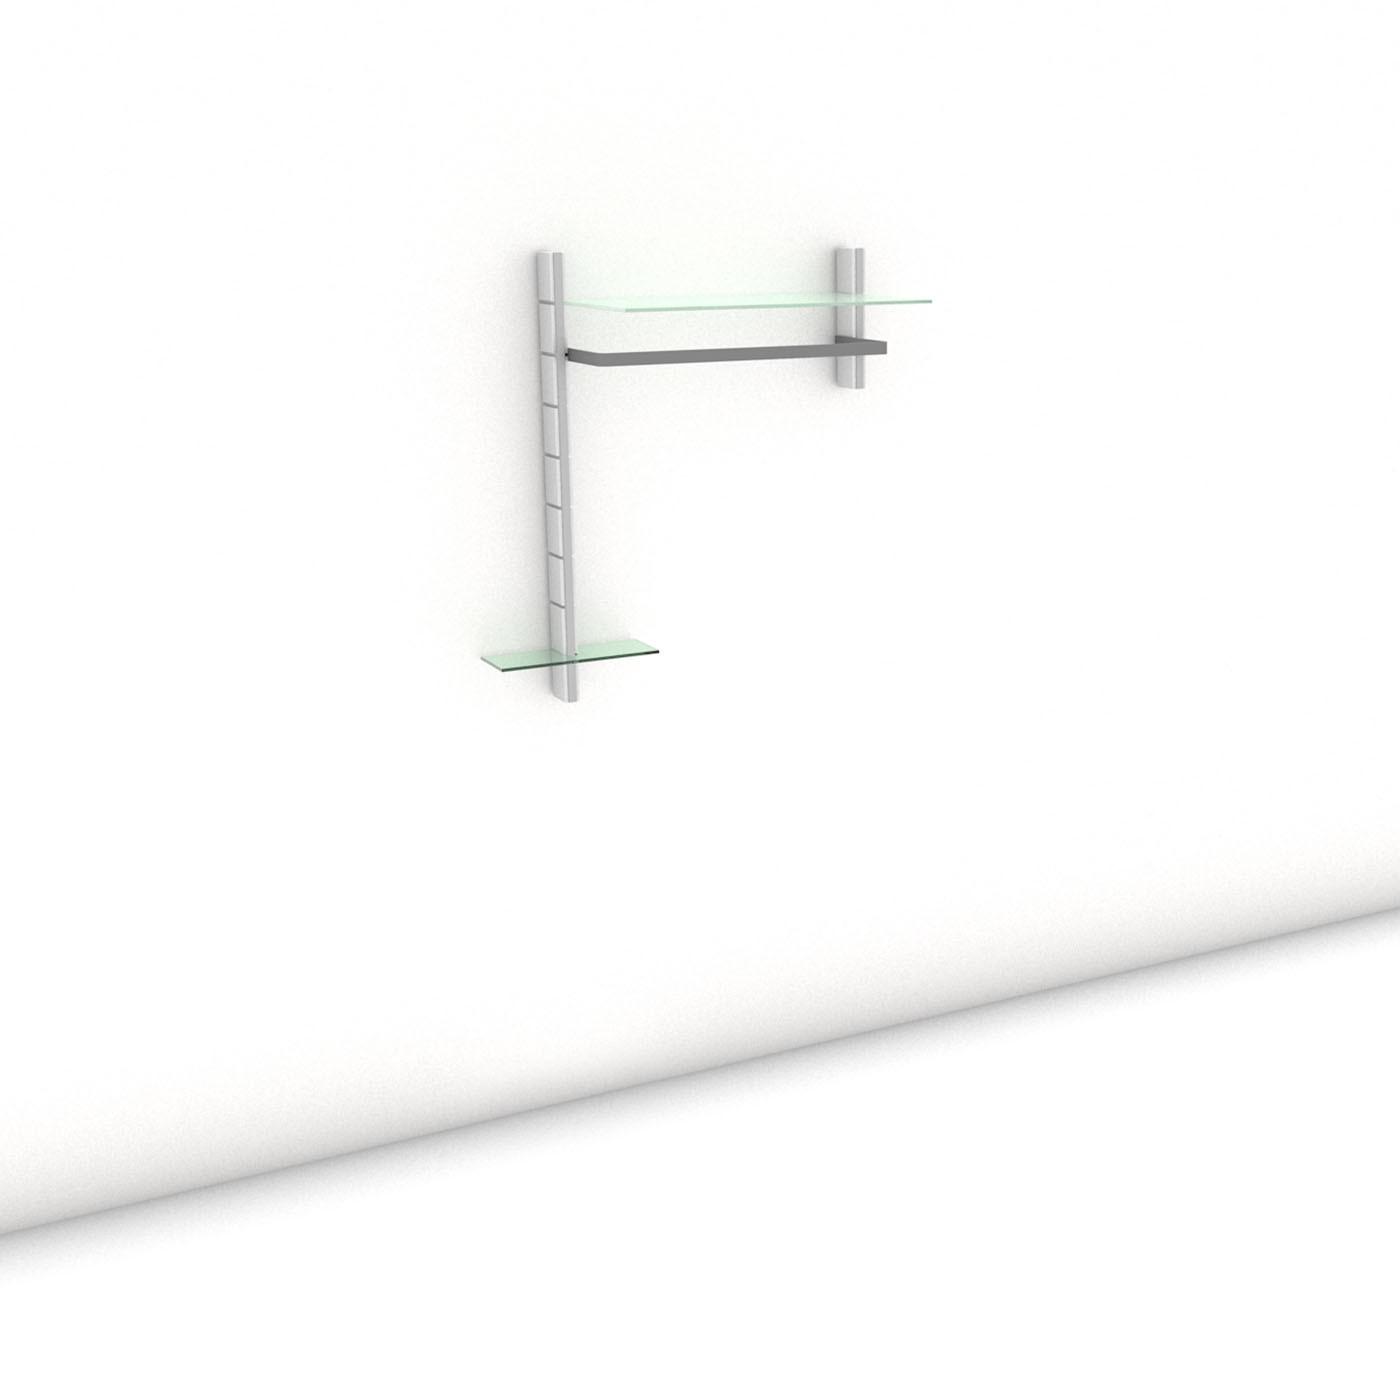 Garderobe - COAT-RACK - Prime (L) 102 - Maß: 102 x 107,2 x 45 cm (B x H x T)